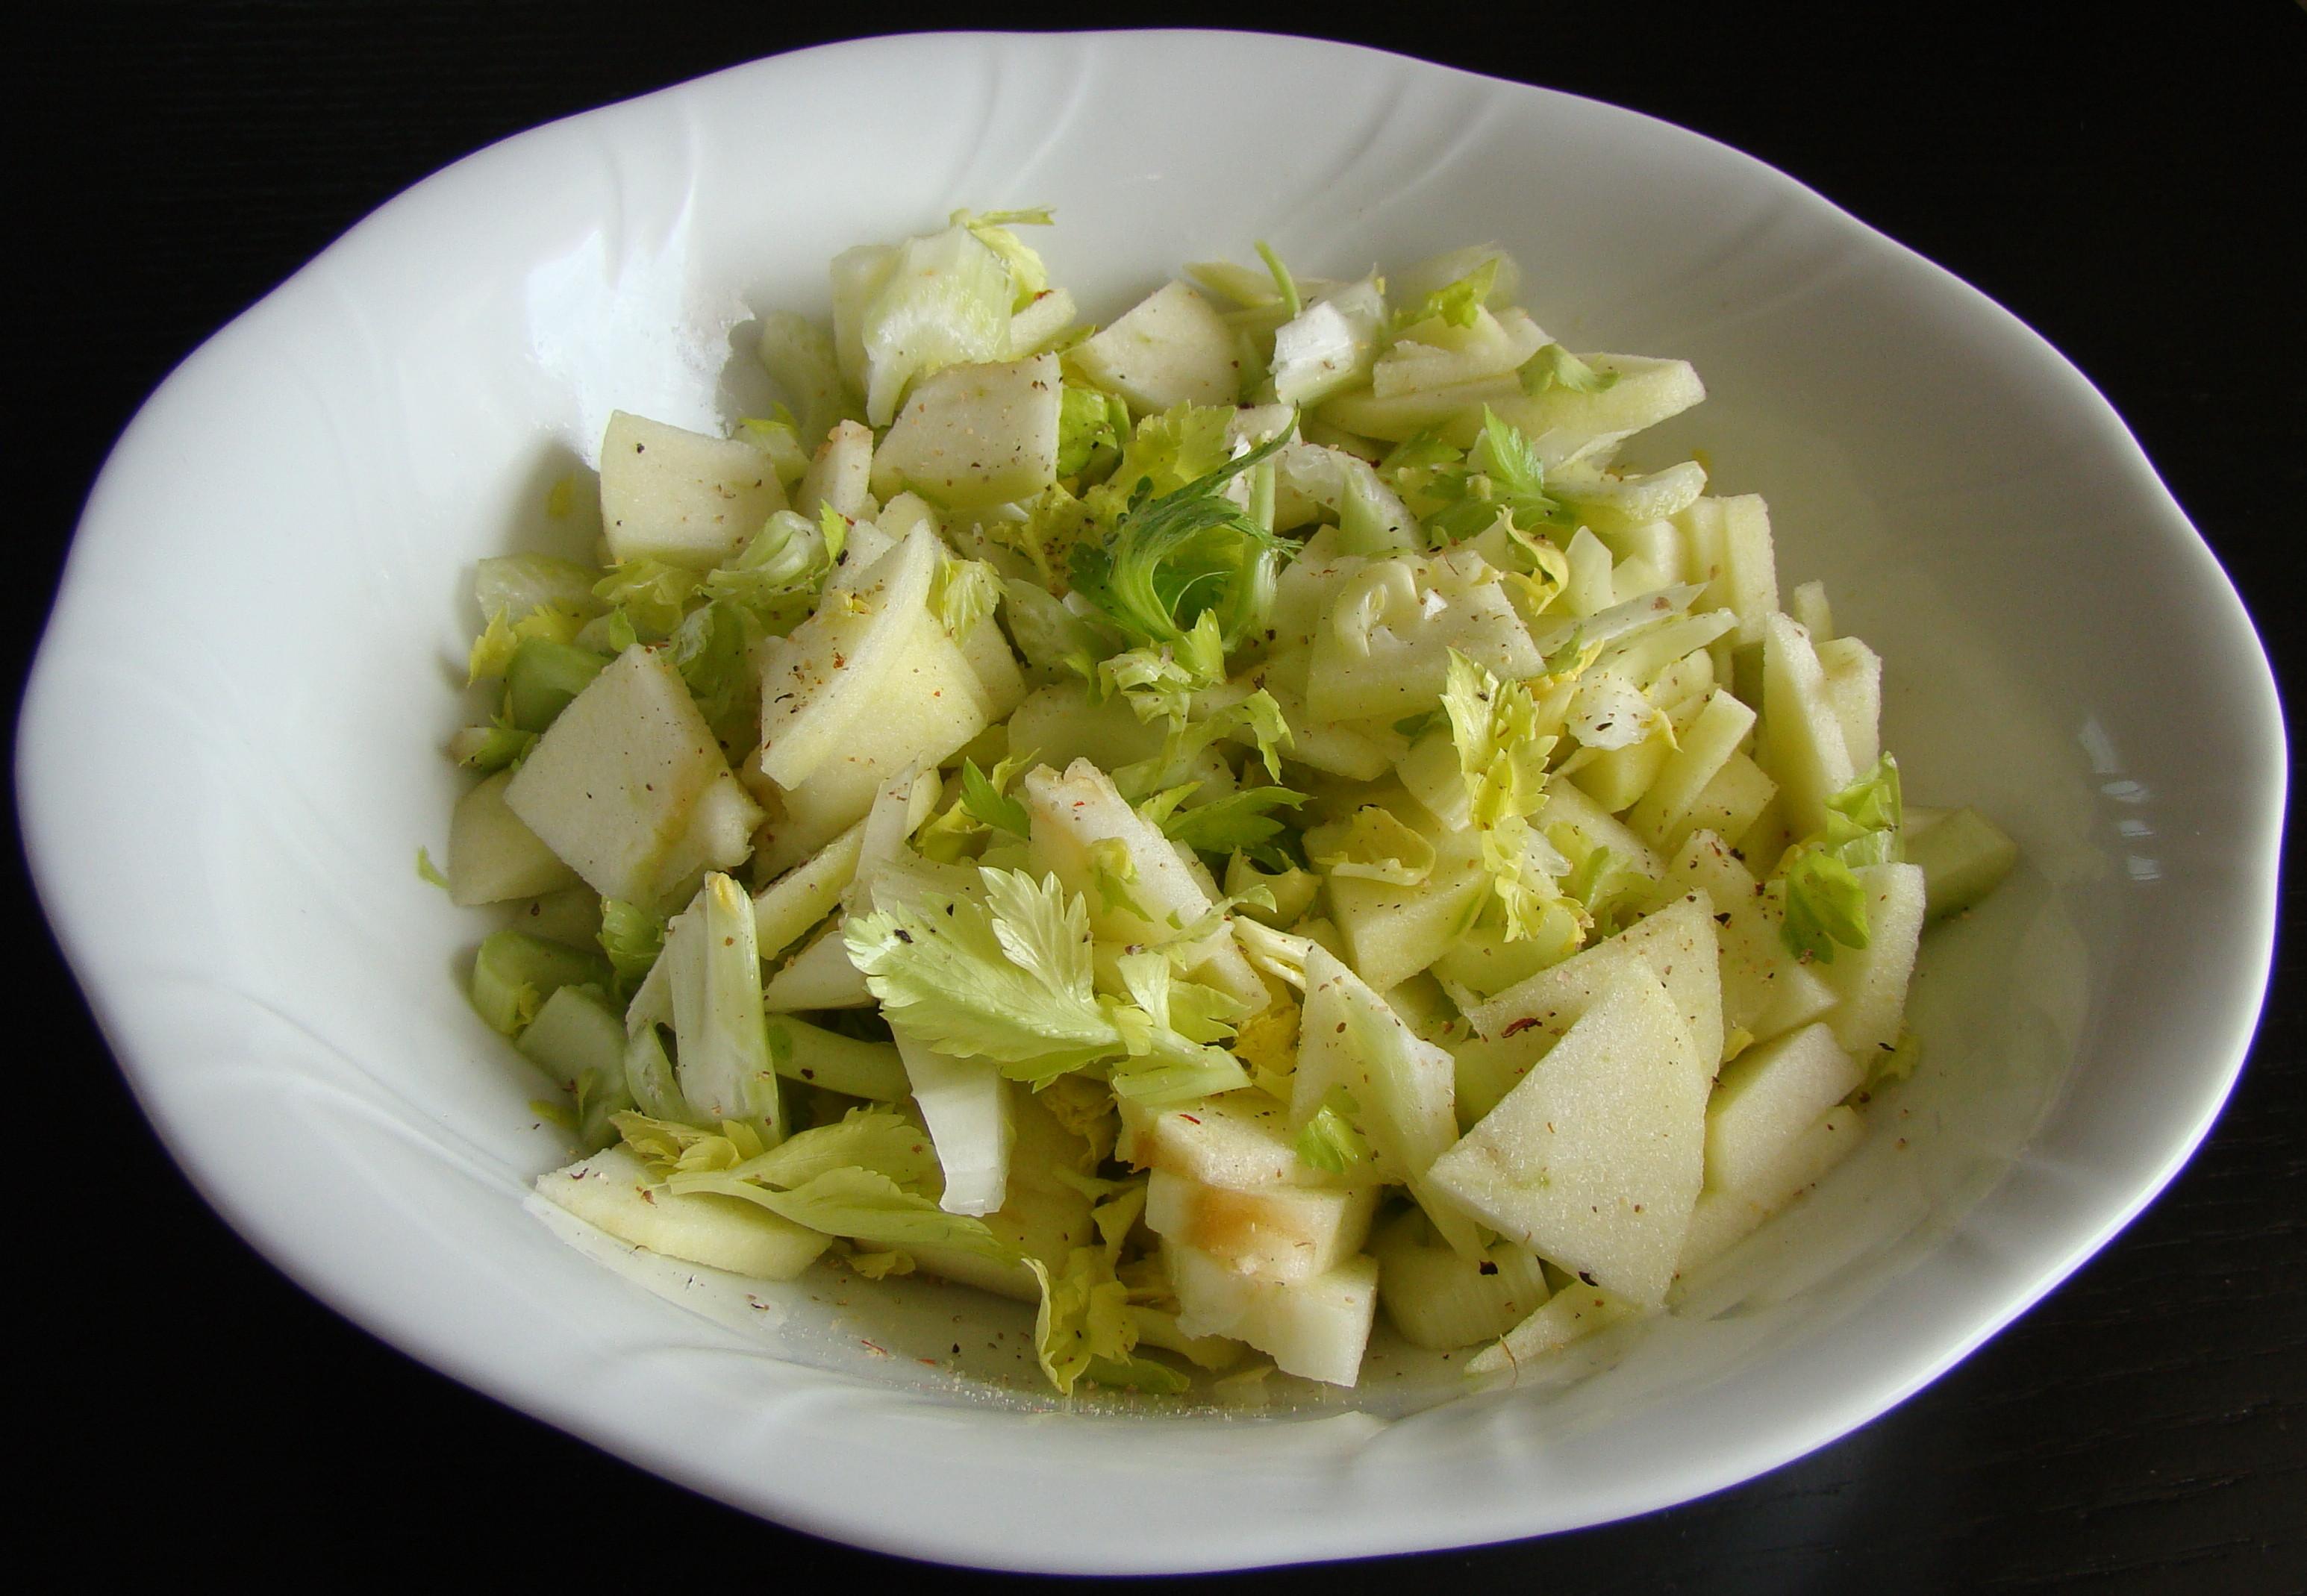 Alimentos para adelgazar receta ensalada de repollo - Ensalada de apio y zanahoria ...